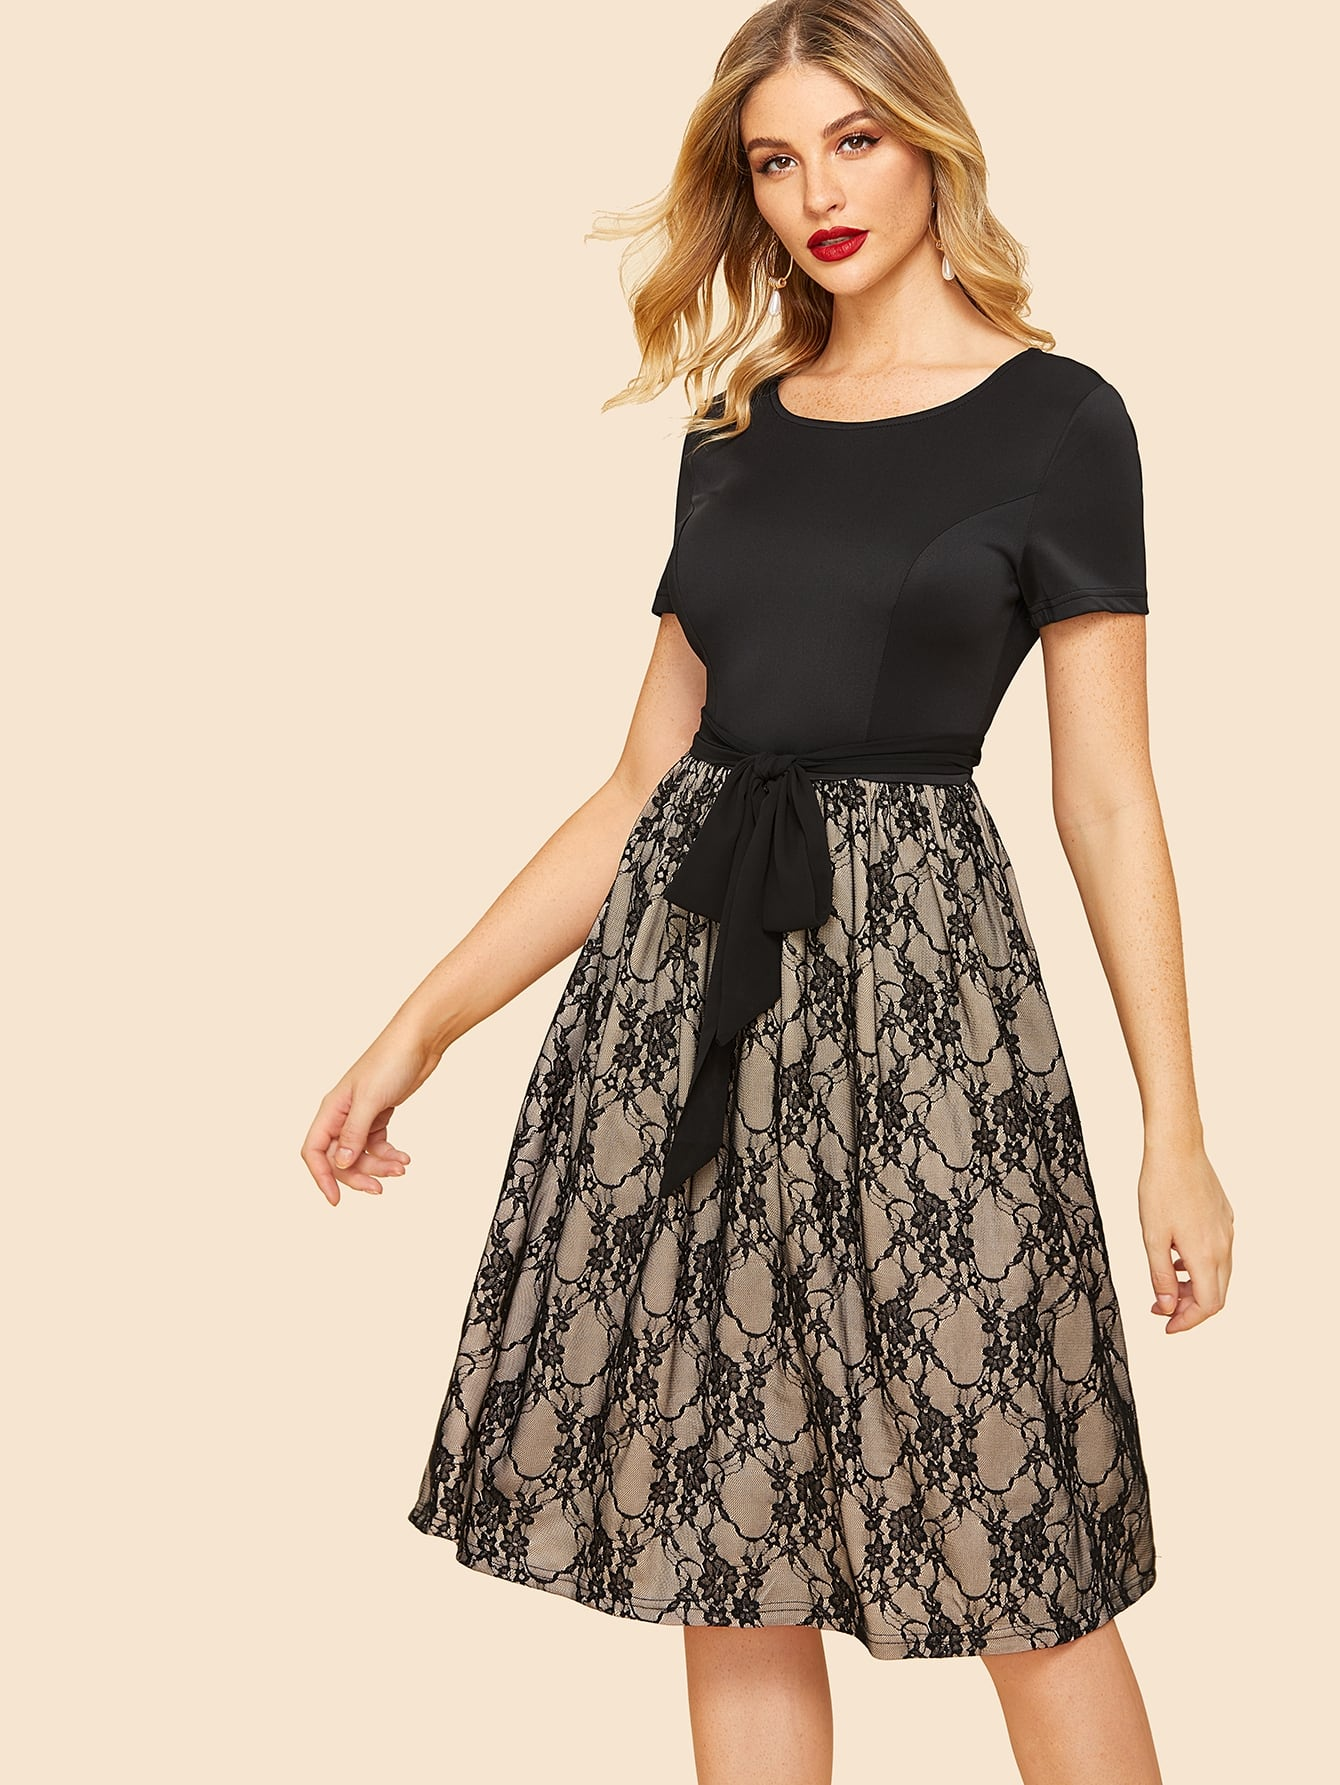 50s Self Tie Lace Contrast Dress 50s Self Tie Lace Contrast Dress